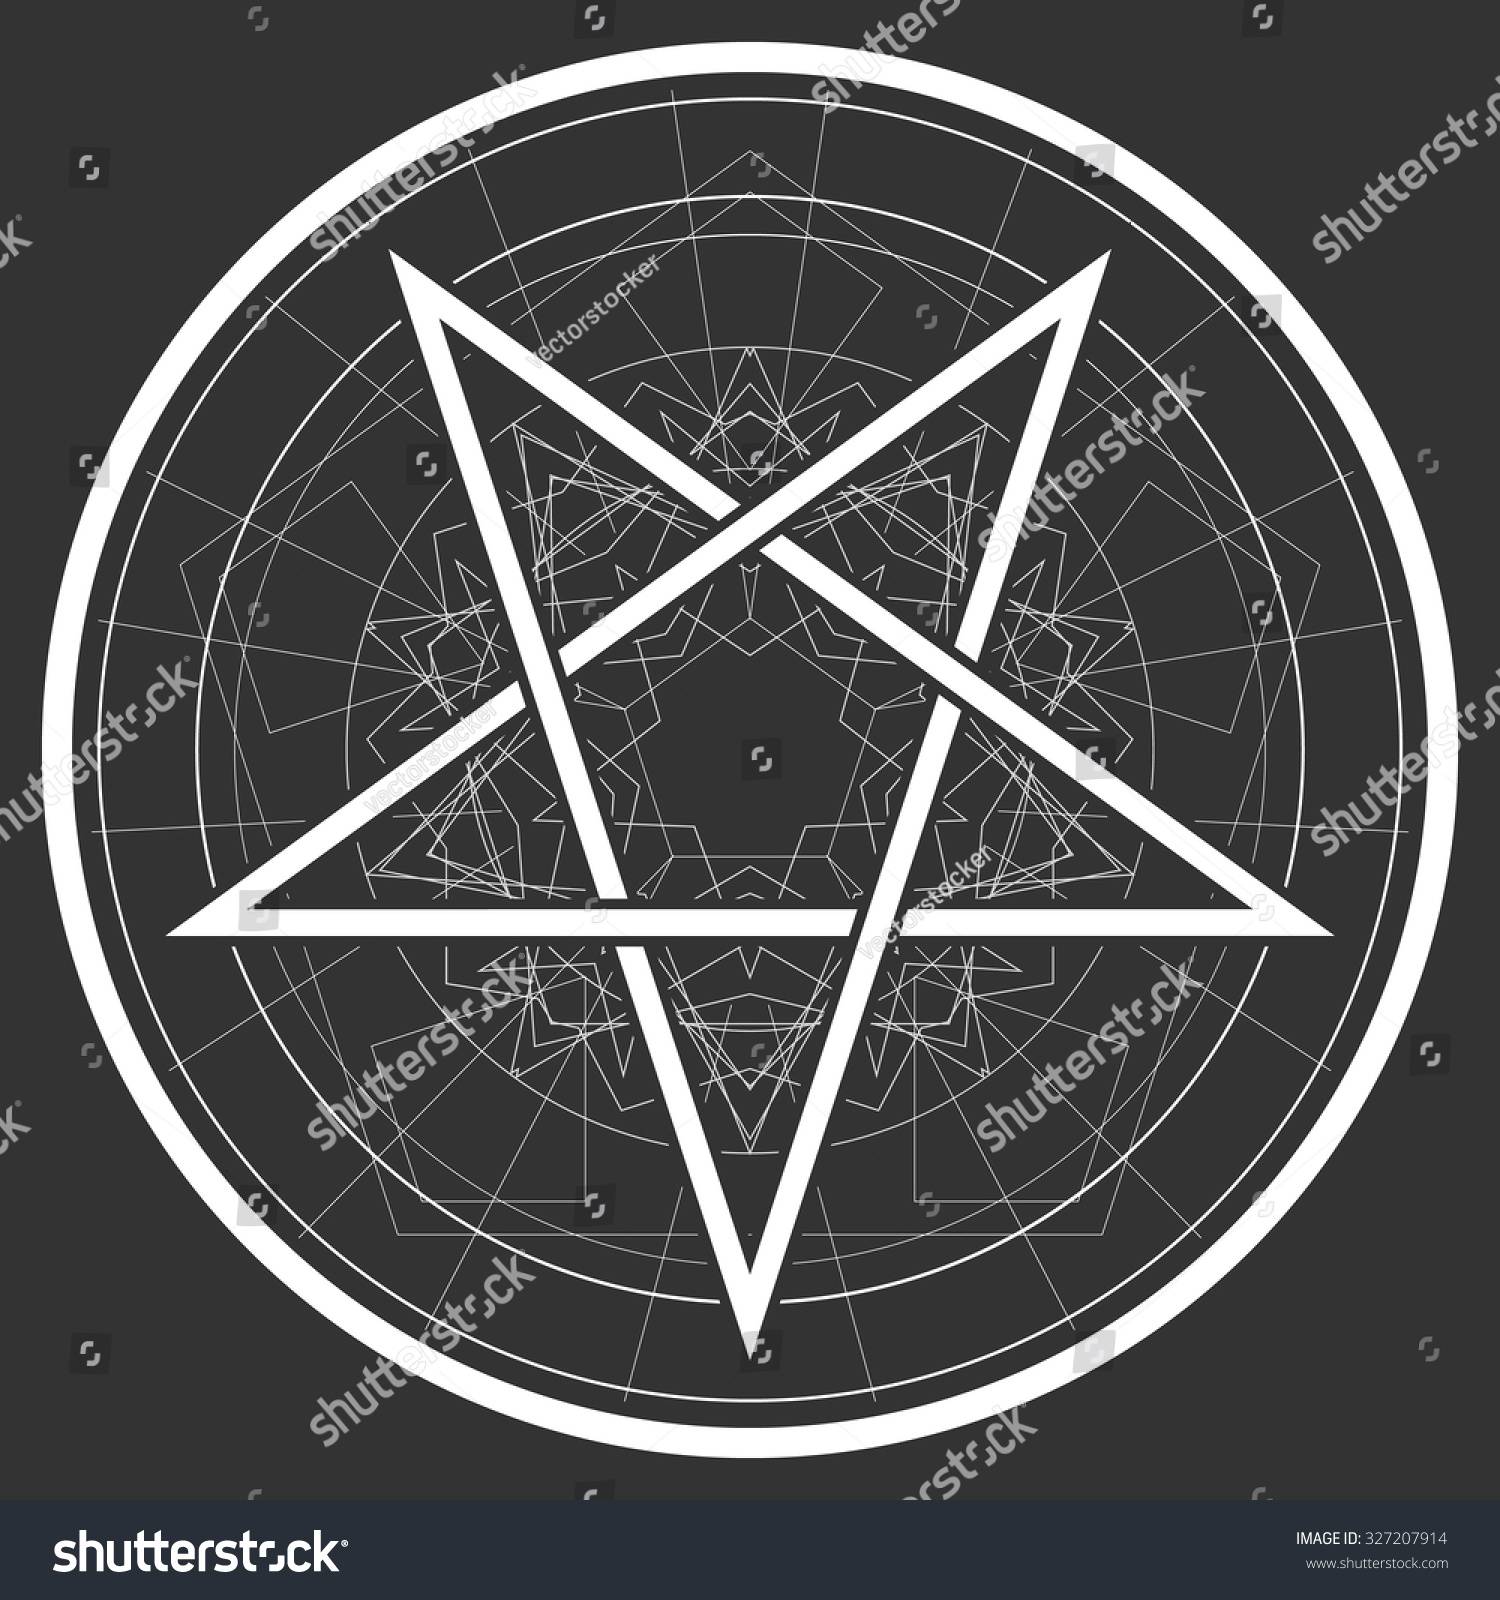 Baphomet star reversed pentagram satanic sign stock vector baphomet star reversed pentagram satanic sign gothic style biocorpaavc Choice Image